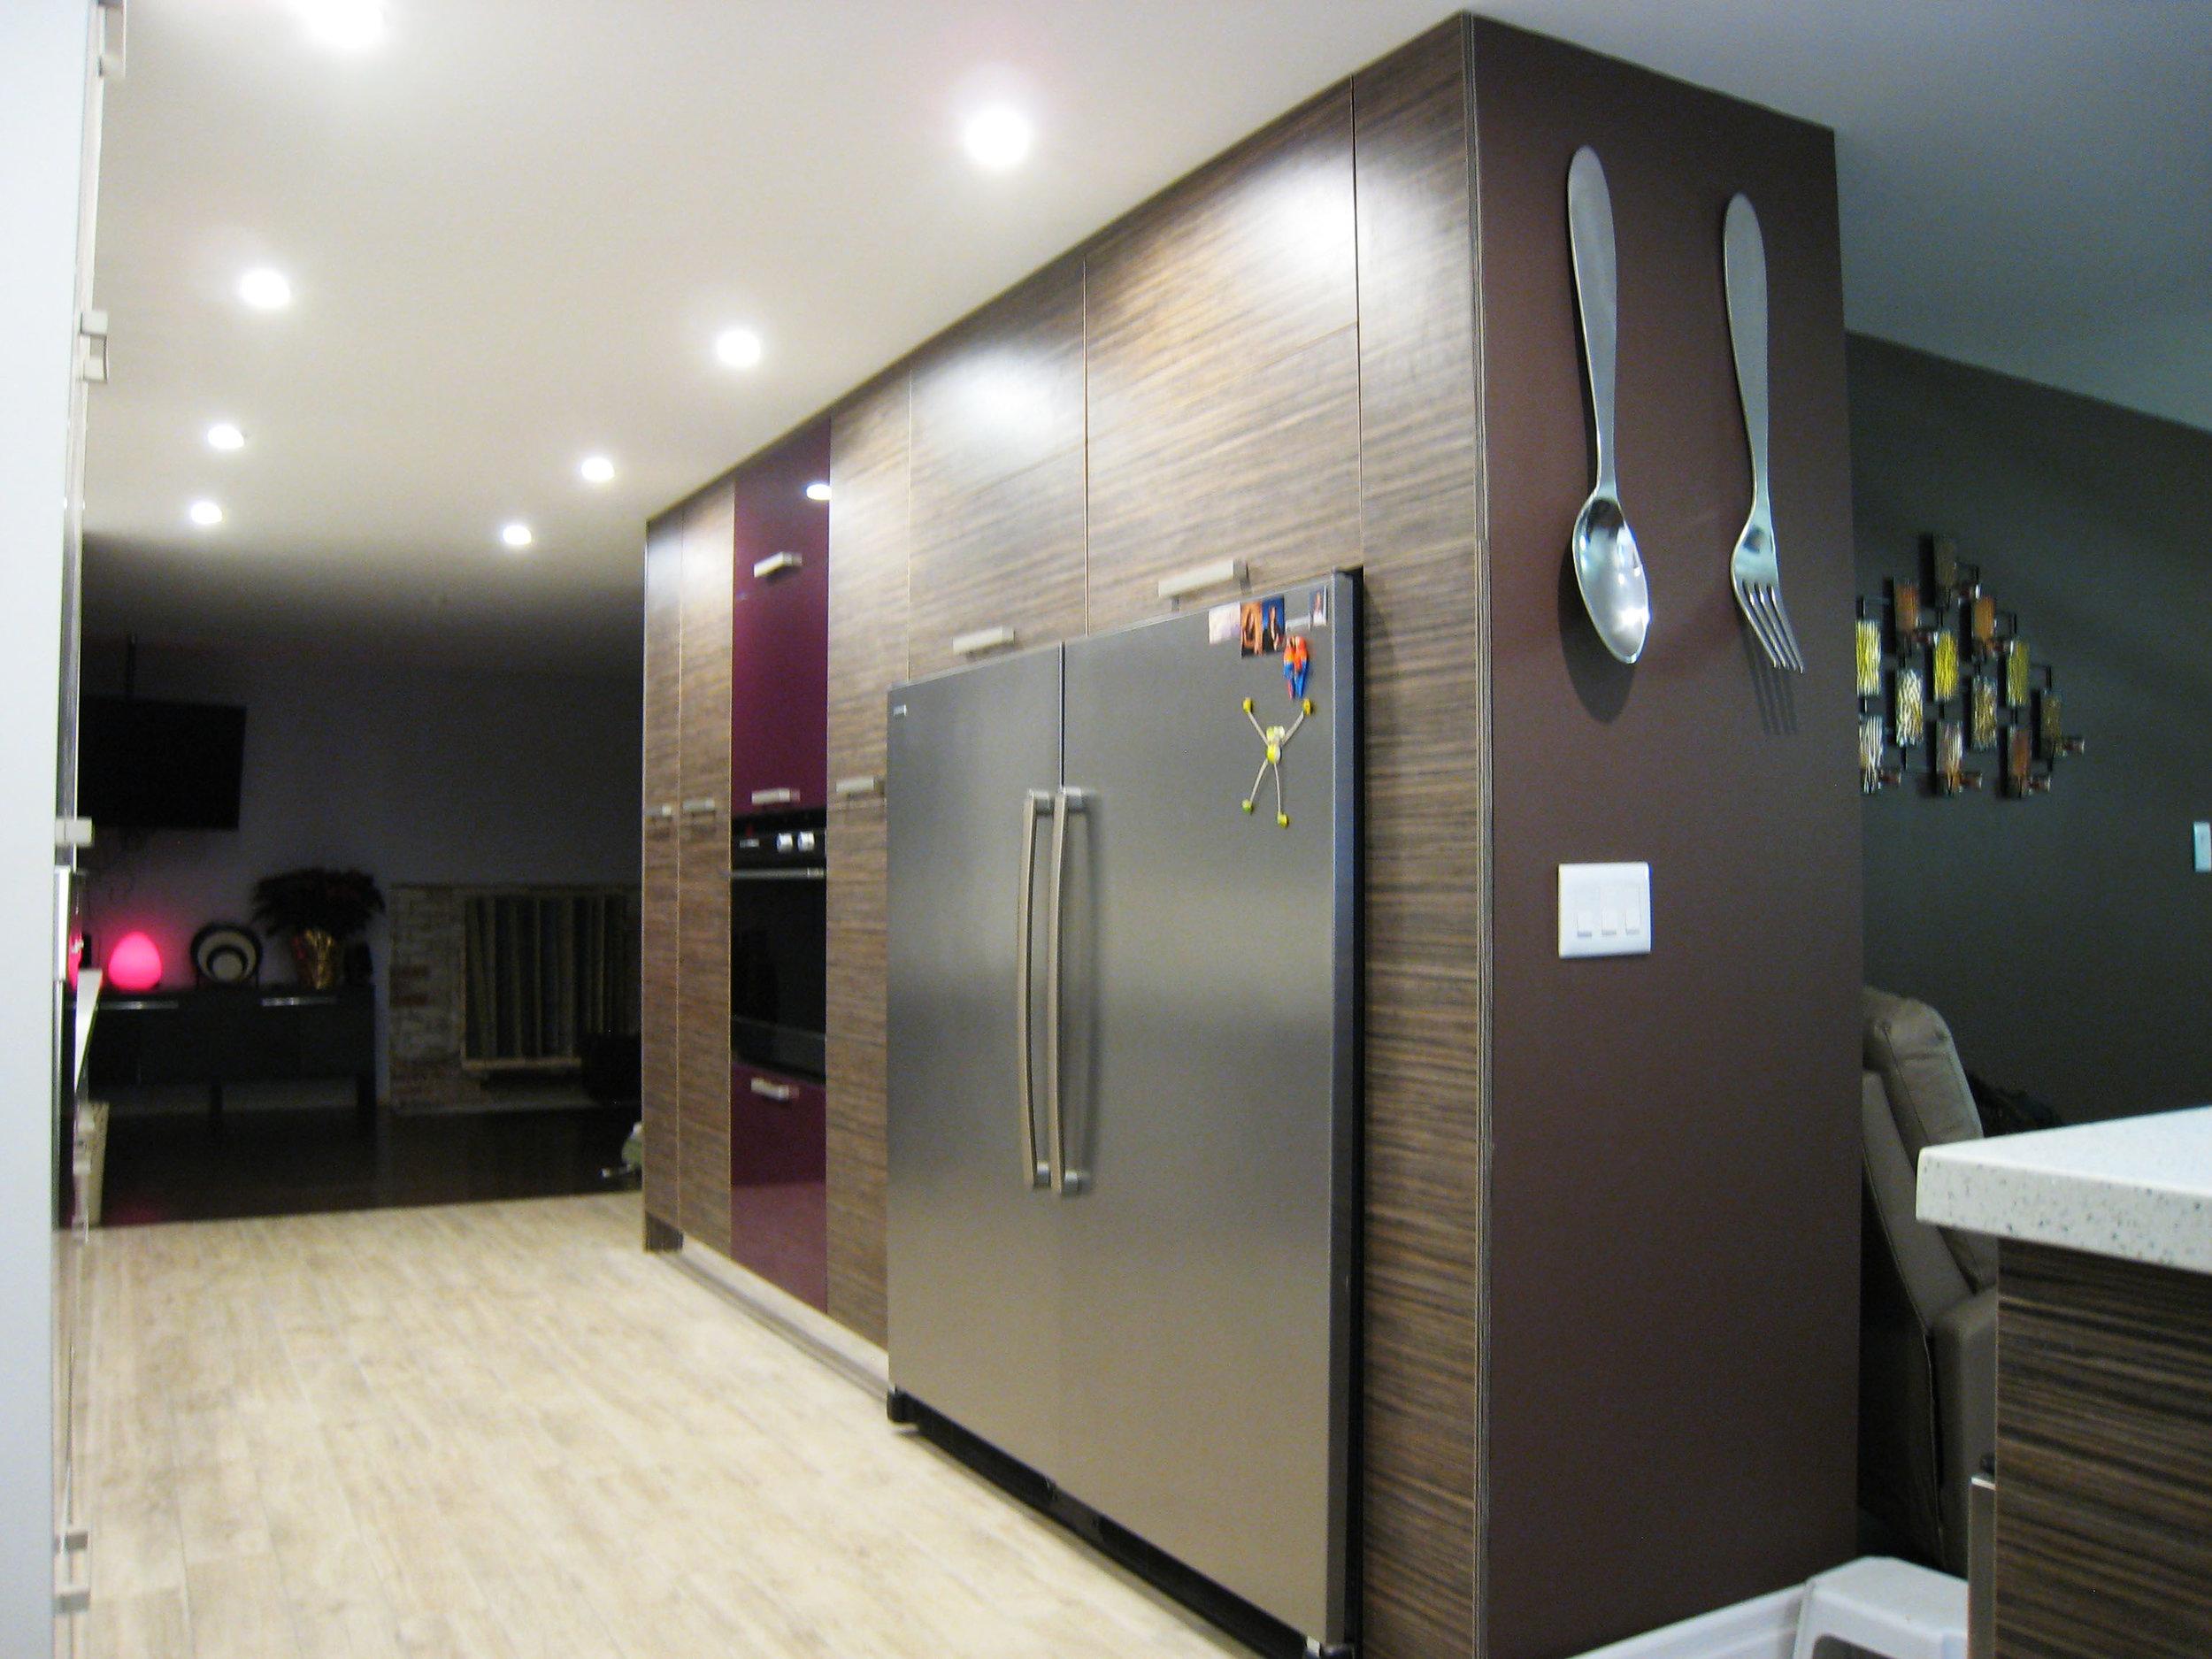 Kitchen 2 Pic 2.JPG